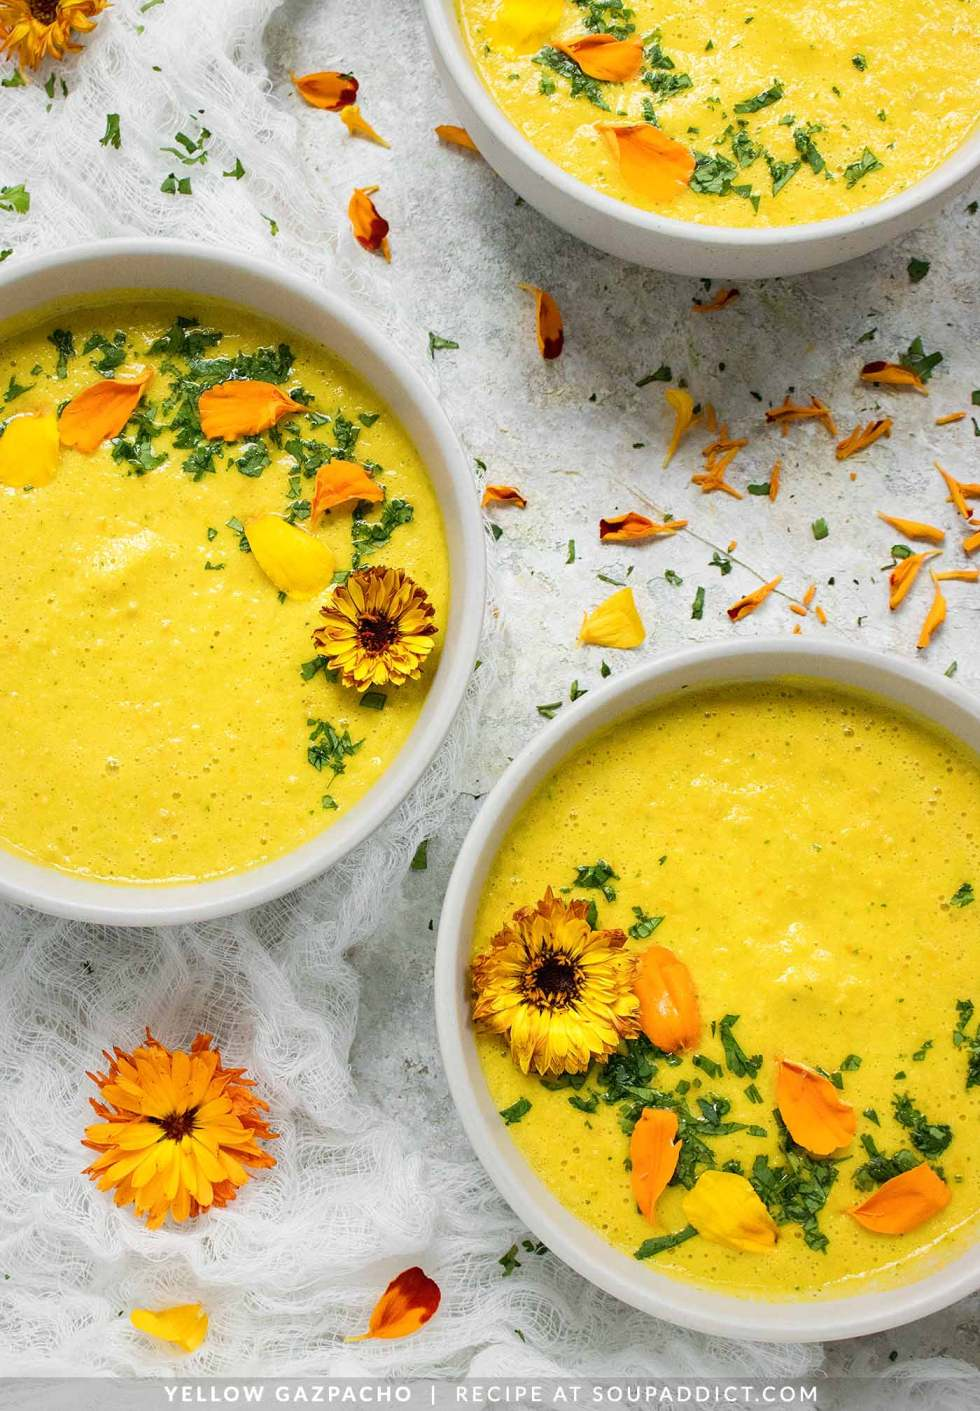 Yellow Gazpacho - The Best Summer Gazpacho - Recipe at SoupAddict.com